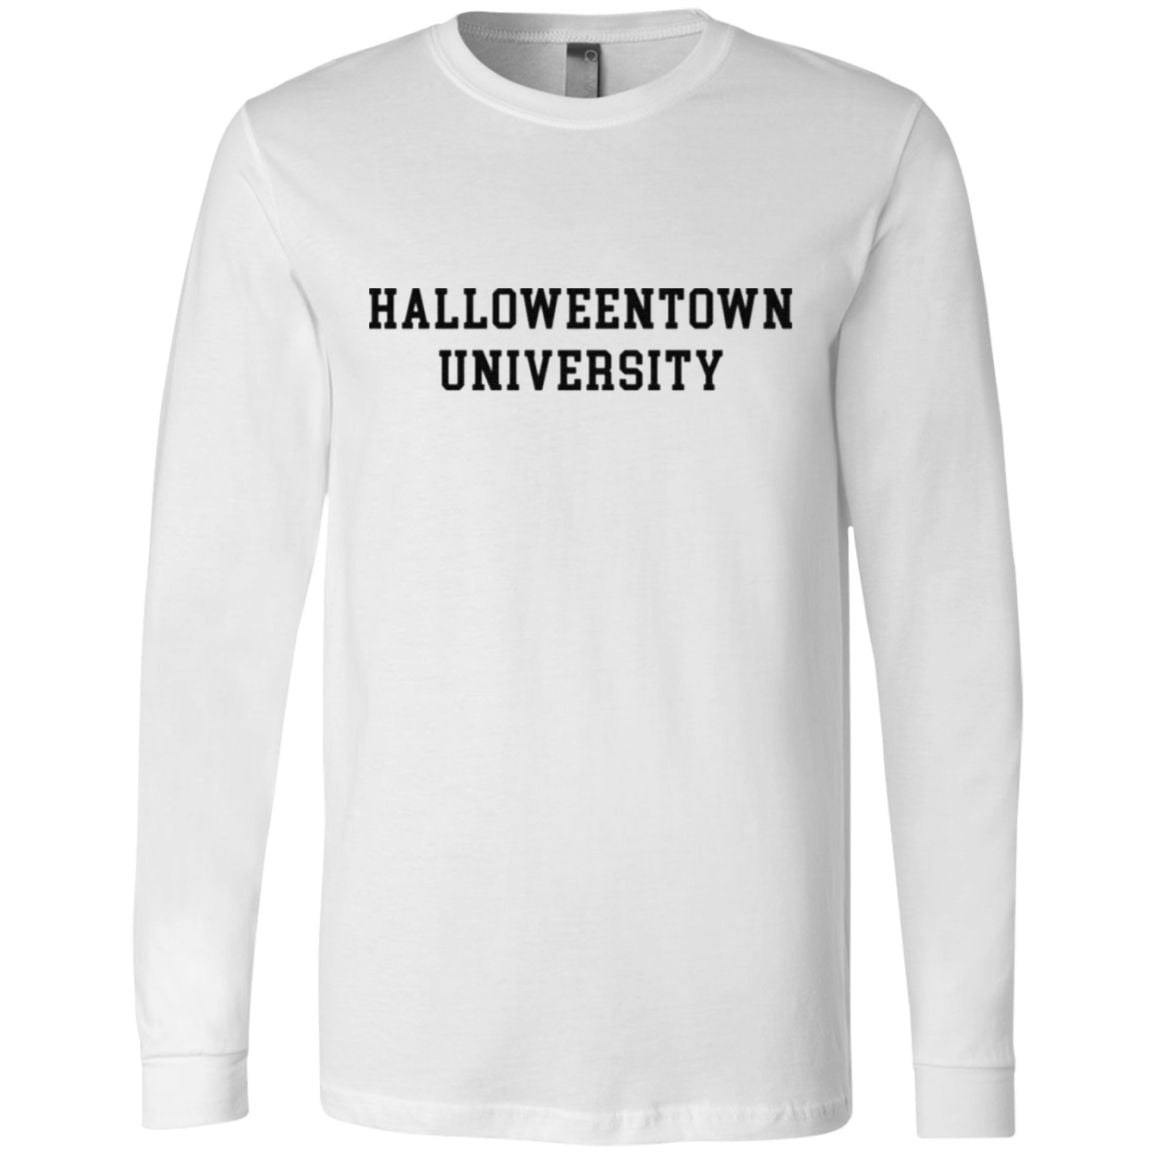 Halloweentown University T Shirt